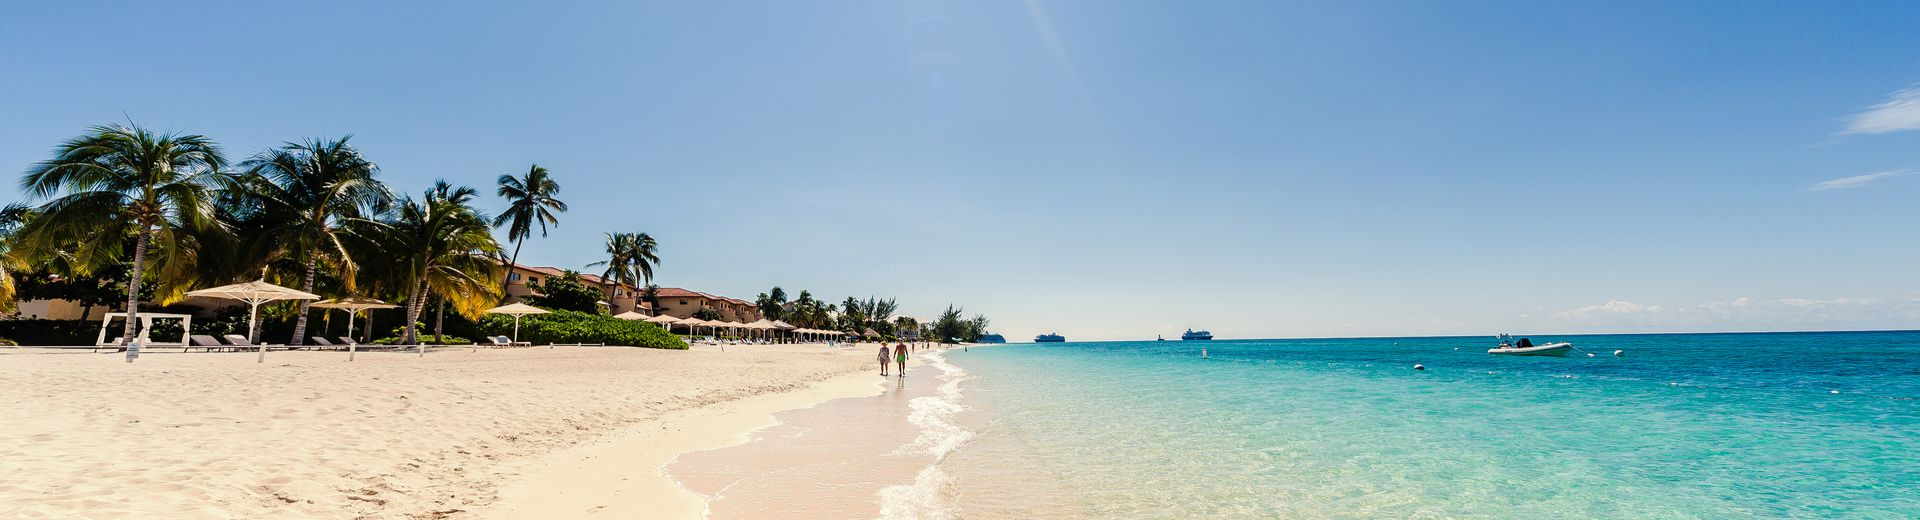 Karibikträume im Dezember mit AIDAdiva